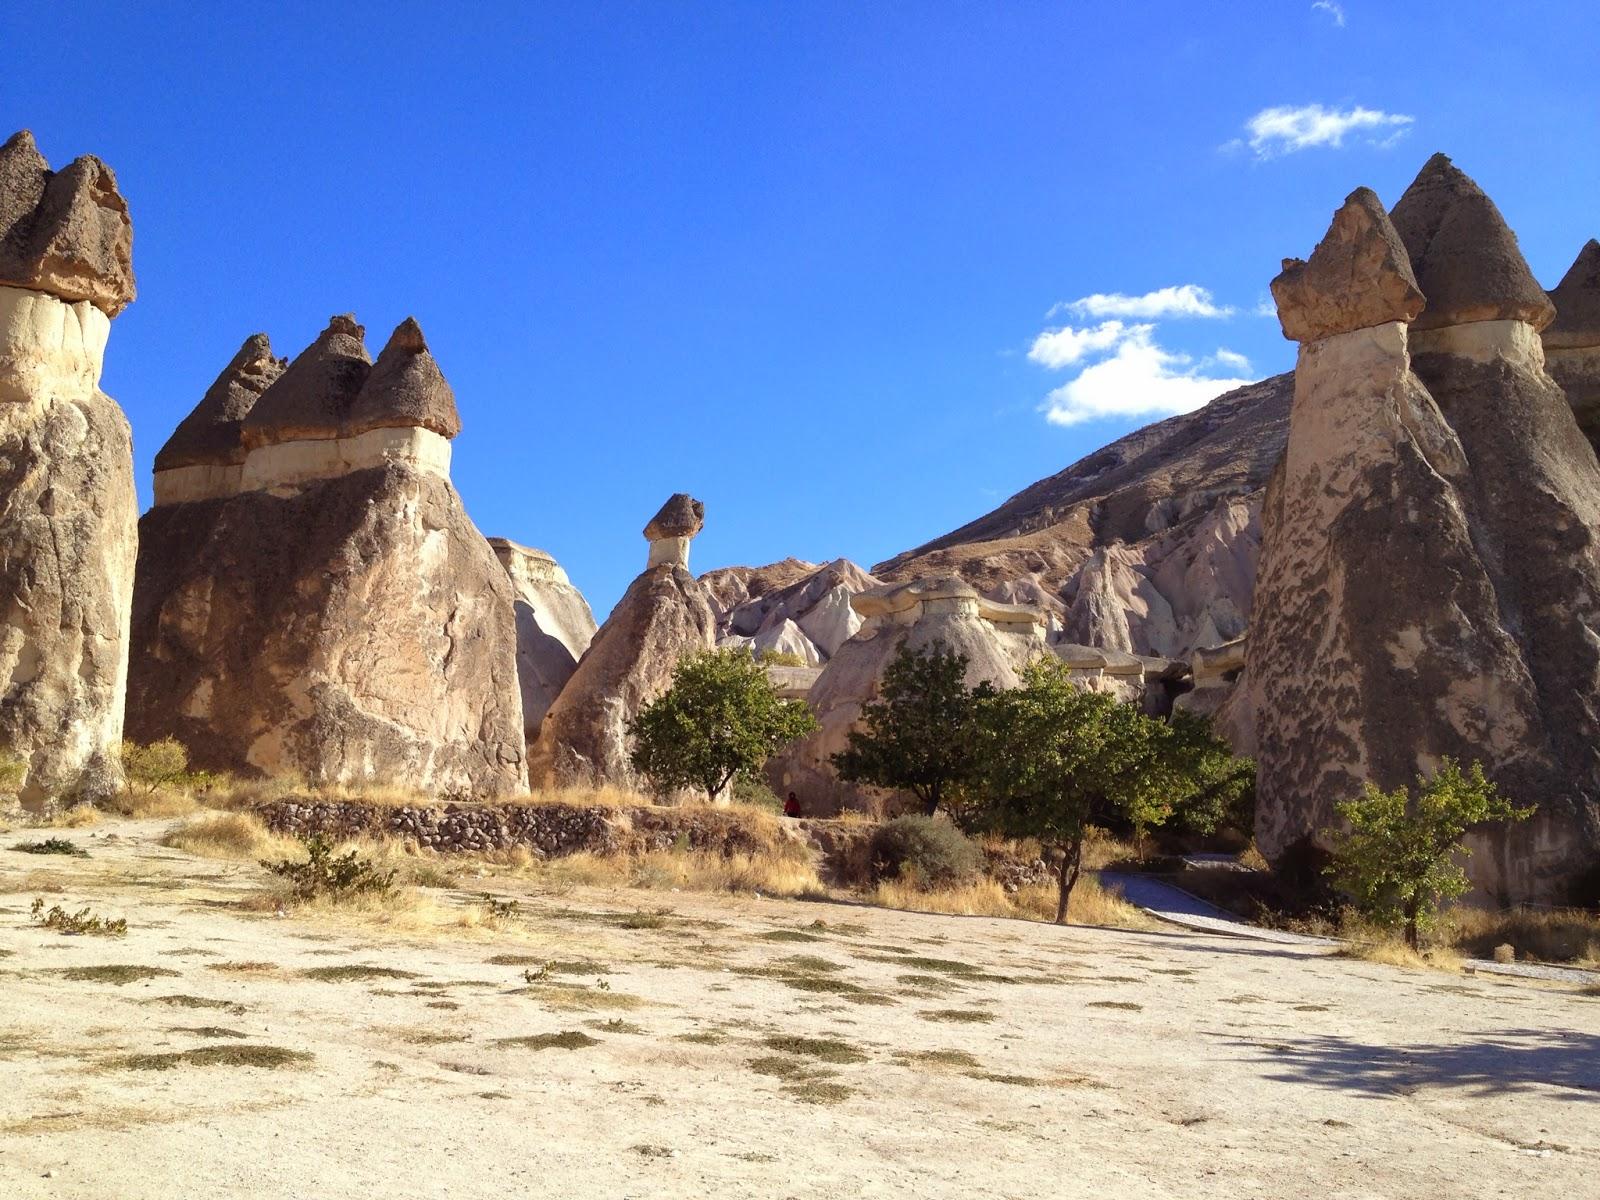 Cappadocia - Fairy Chimneys